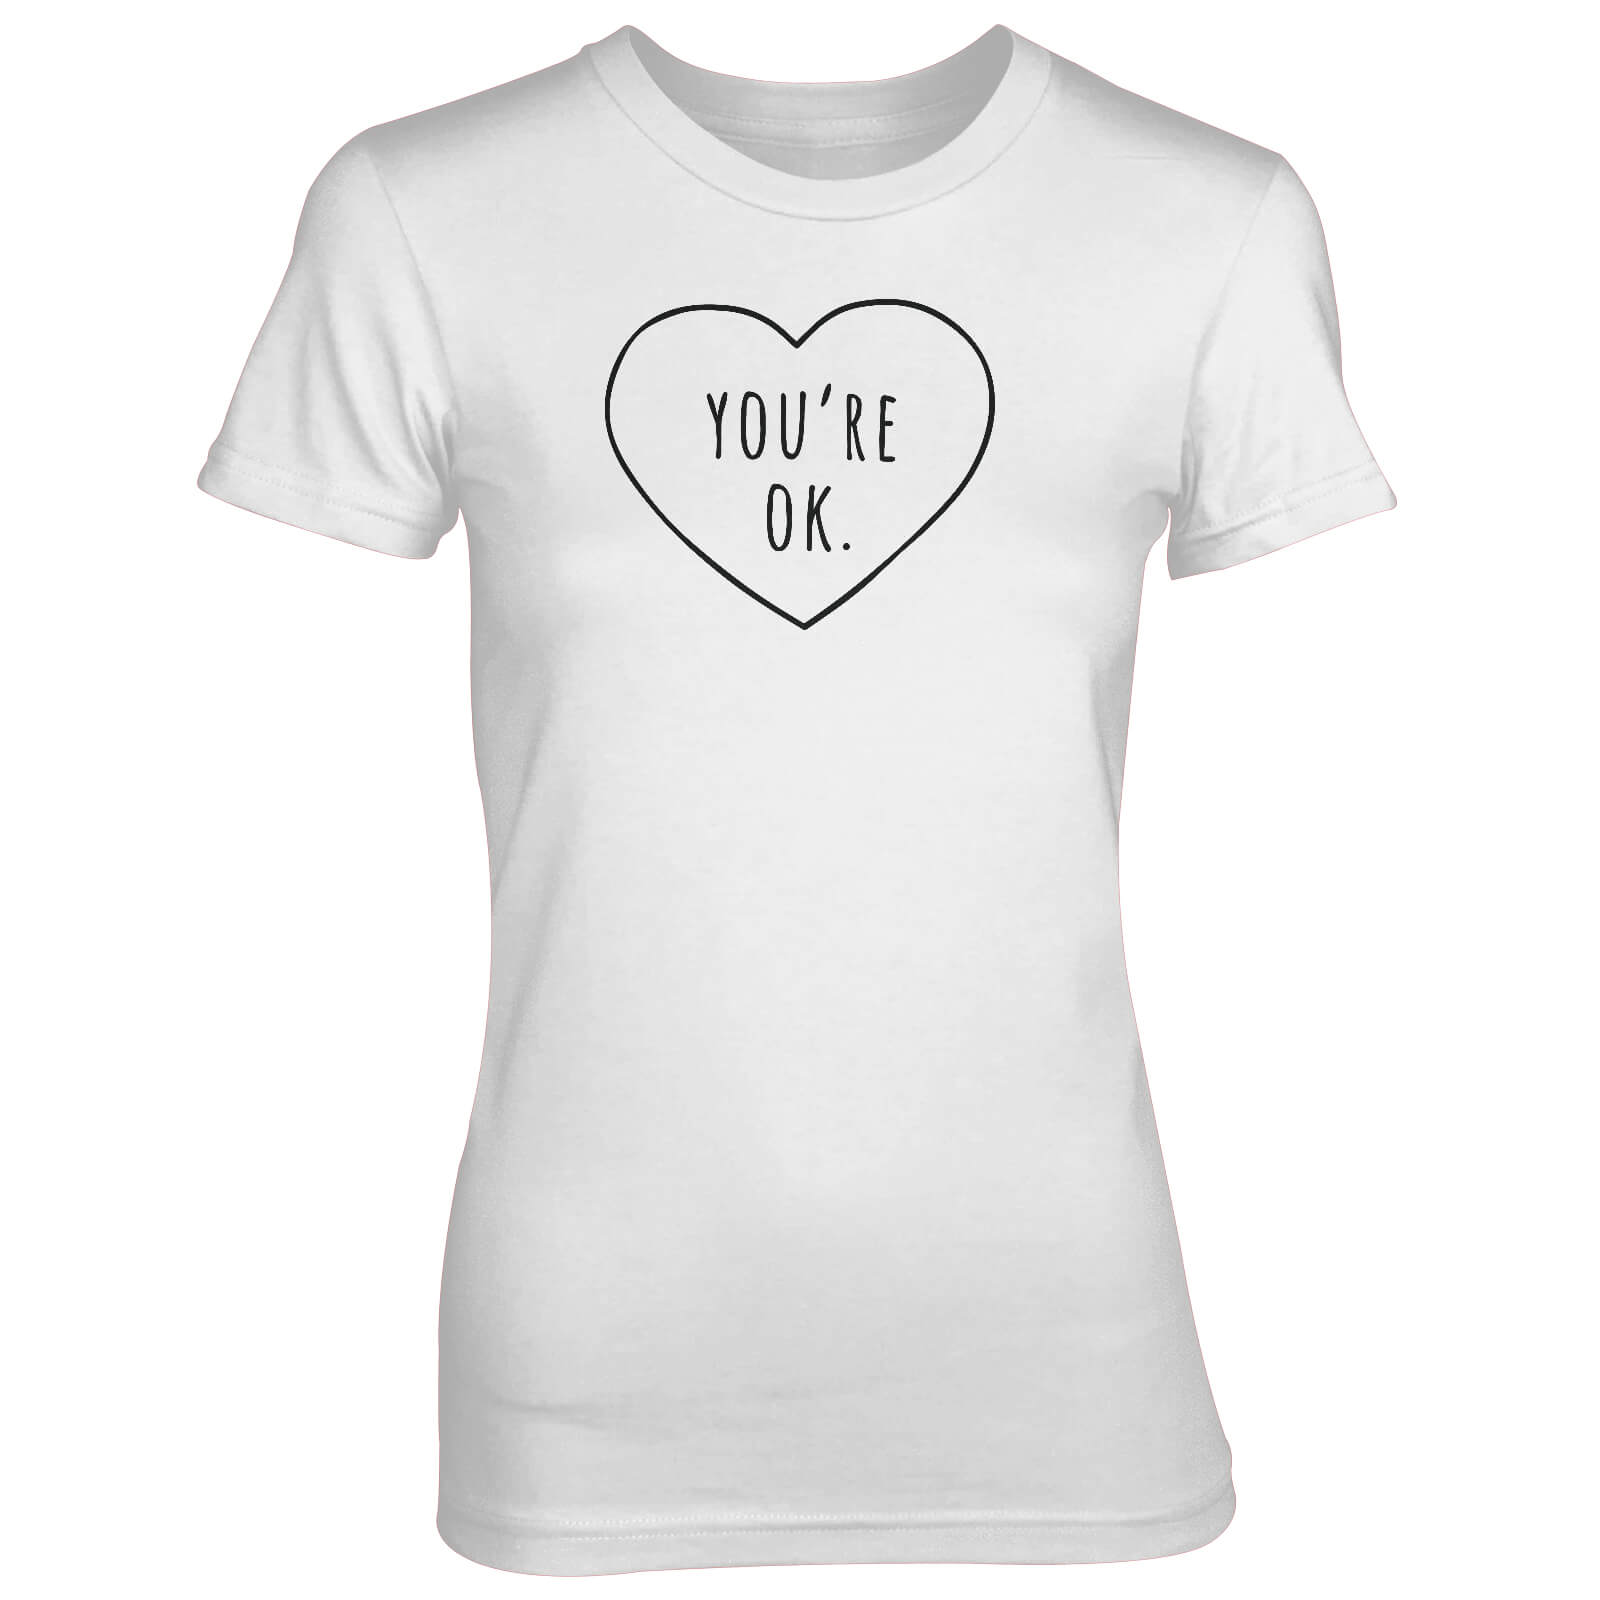 0a8966e8ce4 You re Ok Love Heart Women s White T-Shirt Clothing